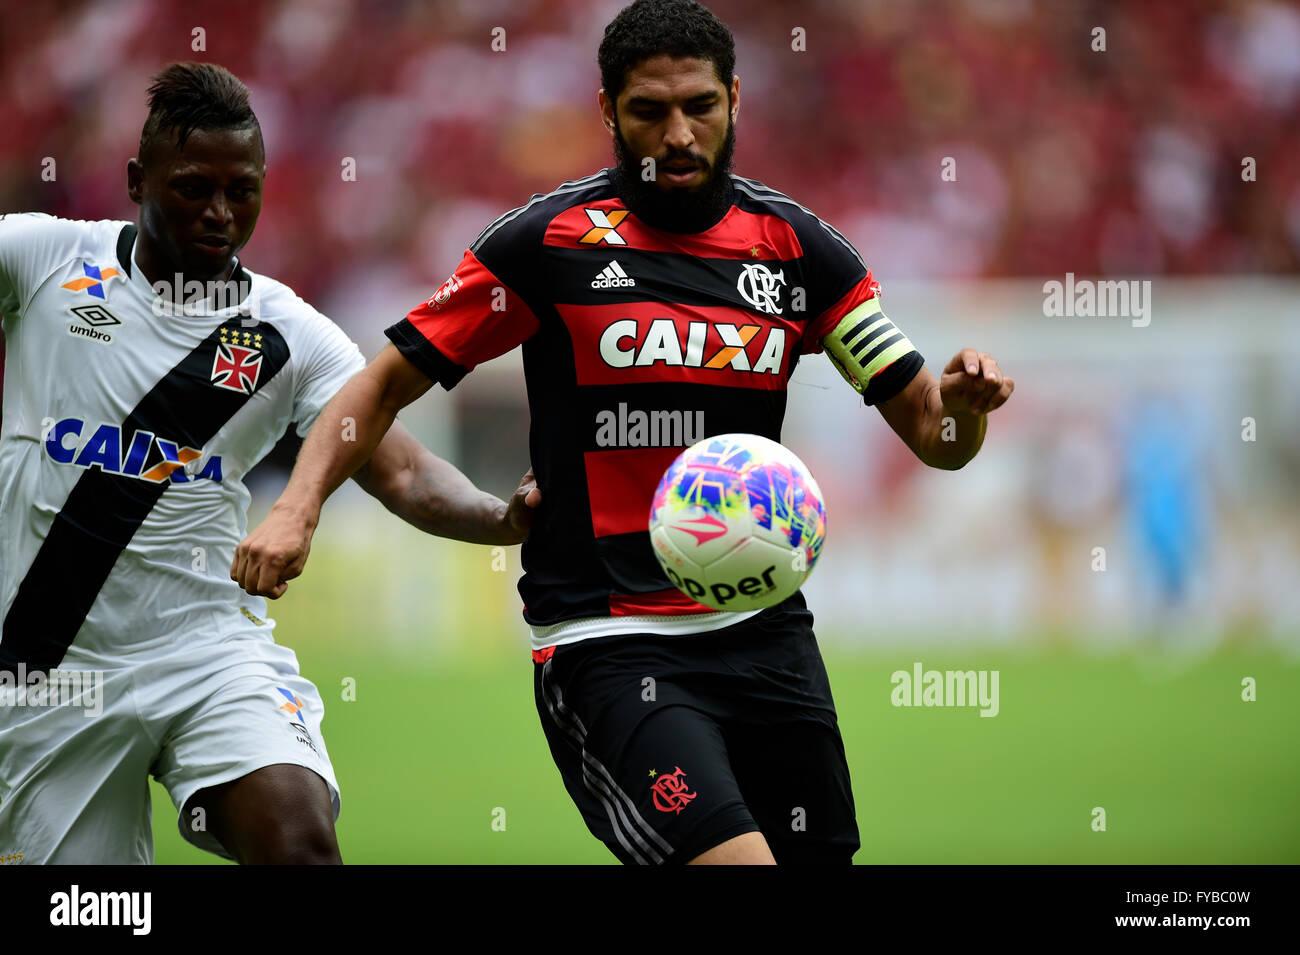 MANAUS, AM - 24/04/2016: FLAMINGO X VASCO - Wallace dispute ball over Flamengo x Vasco held at the Arena da Amaz?nia. - Stock Image